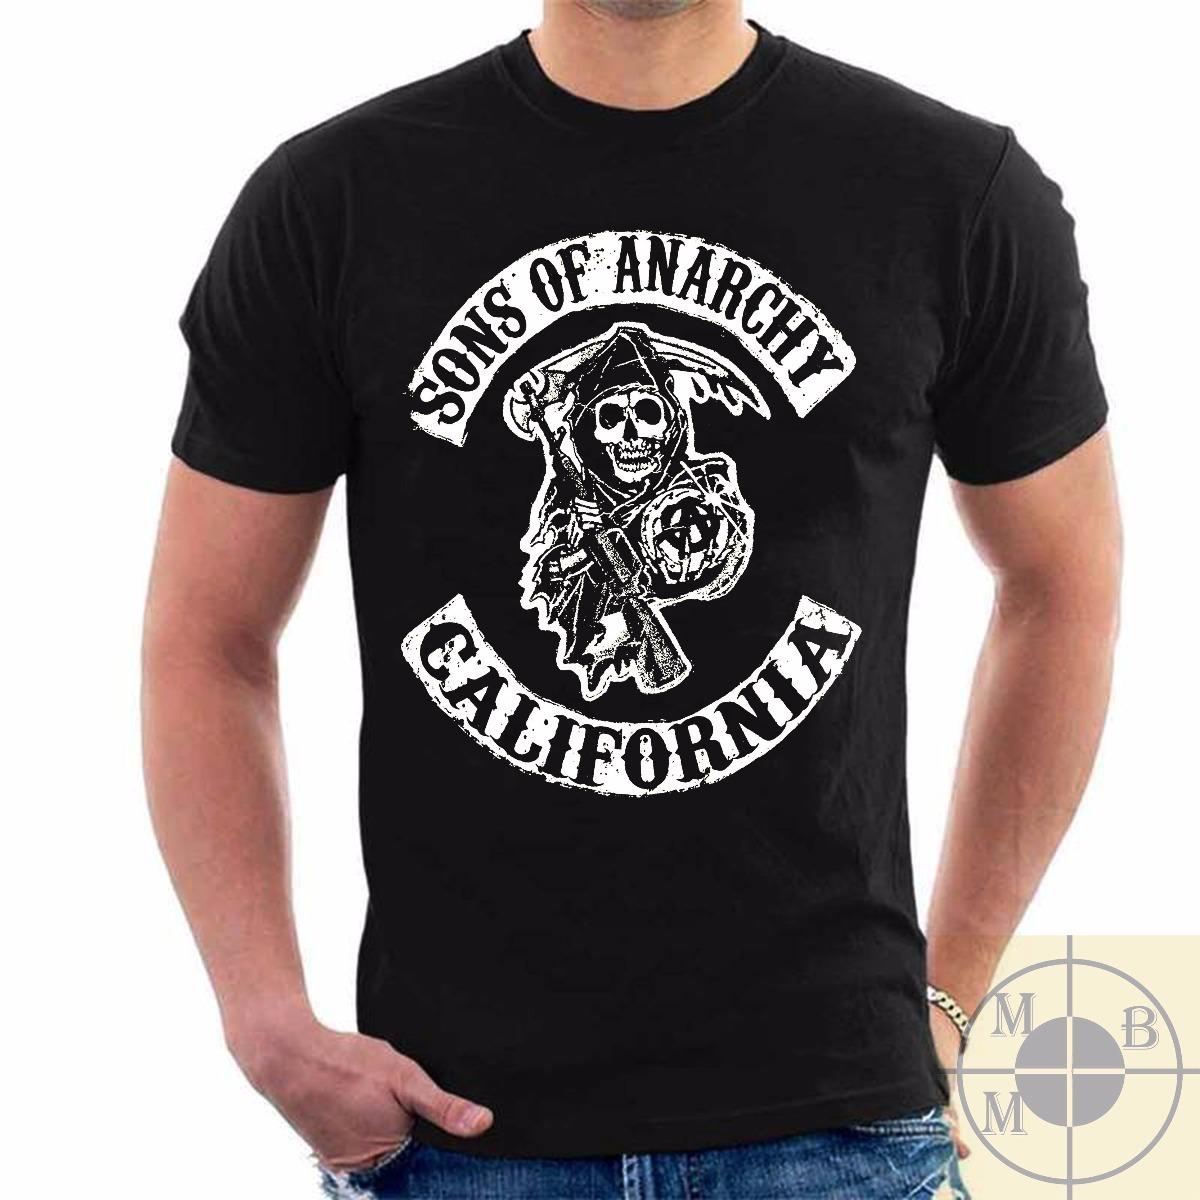 9ba1f10bb3181 camiseta filhos da anarquia geek netflix sons of anarchy. Carregando zoom.